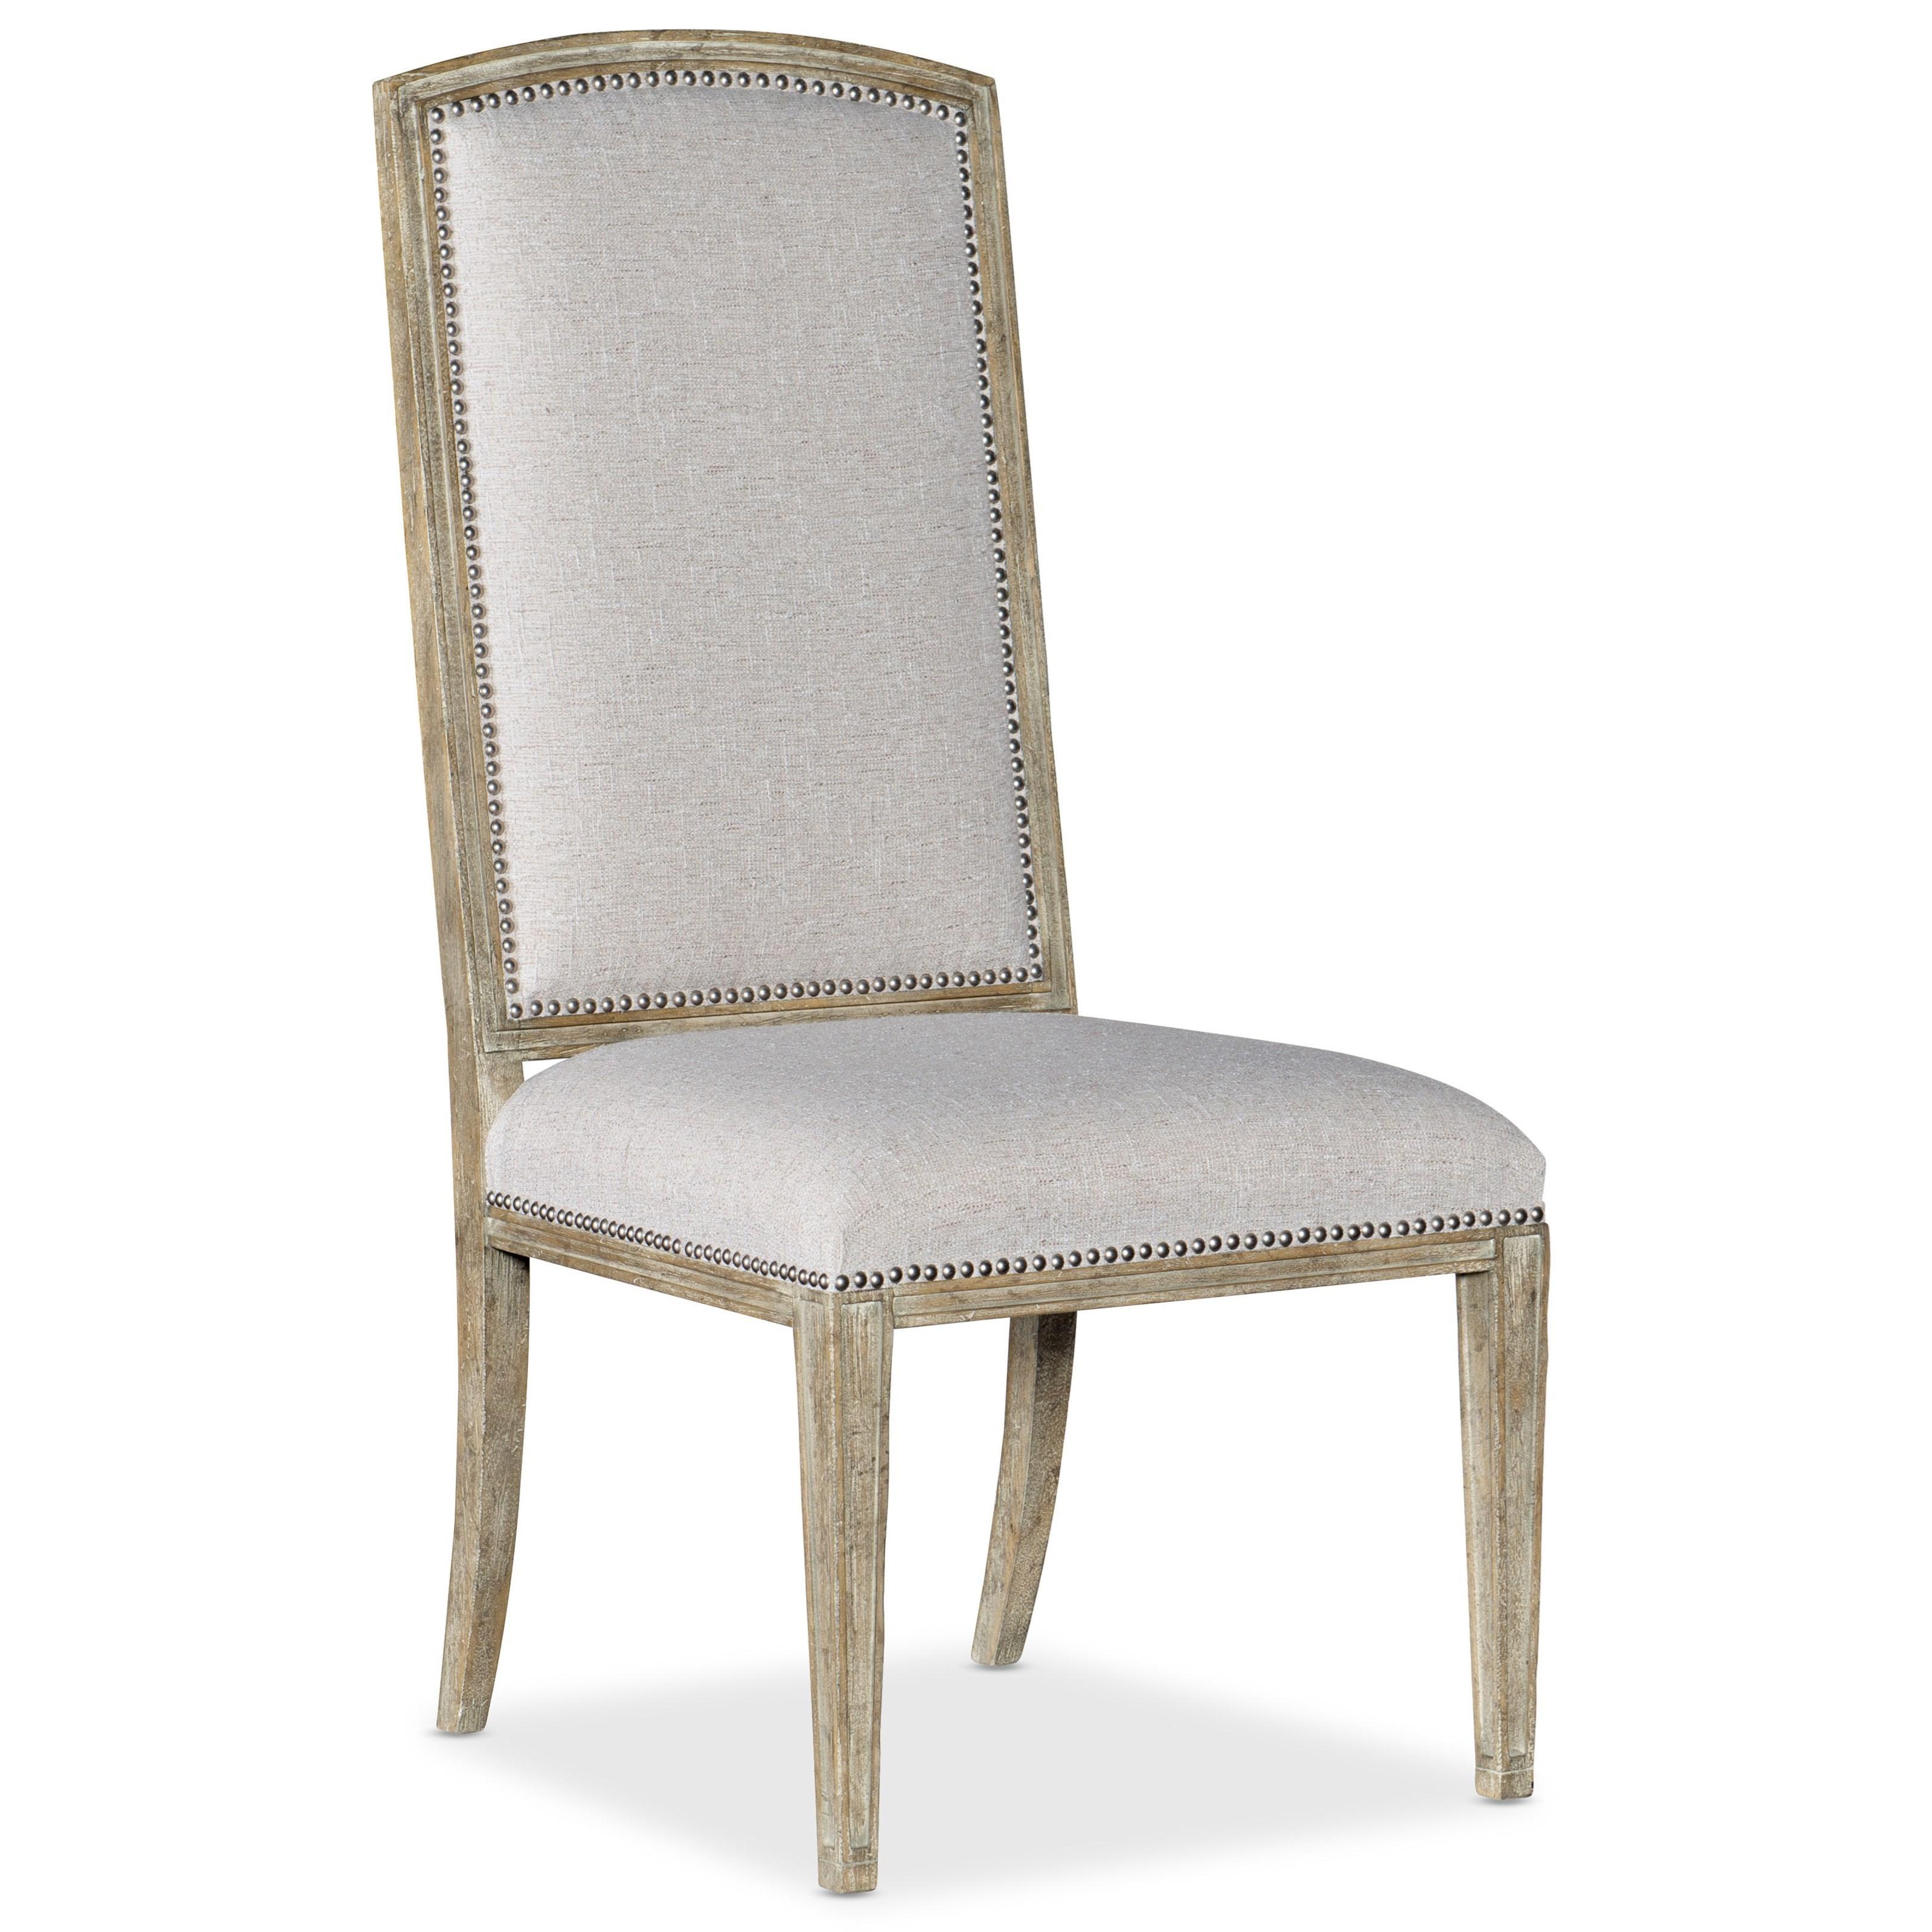 Castella Upholstered Side Chair   by Hooker Furniture at Baer's Furniture